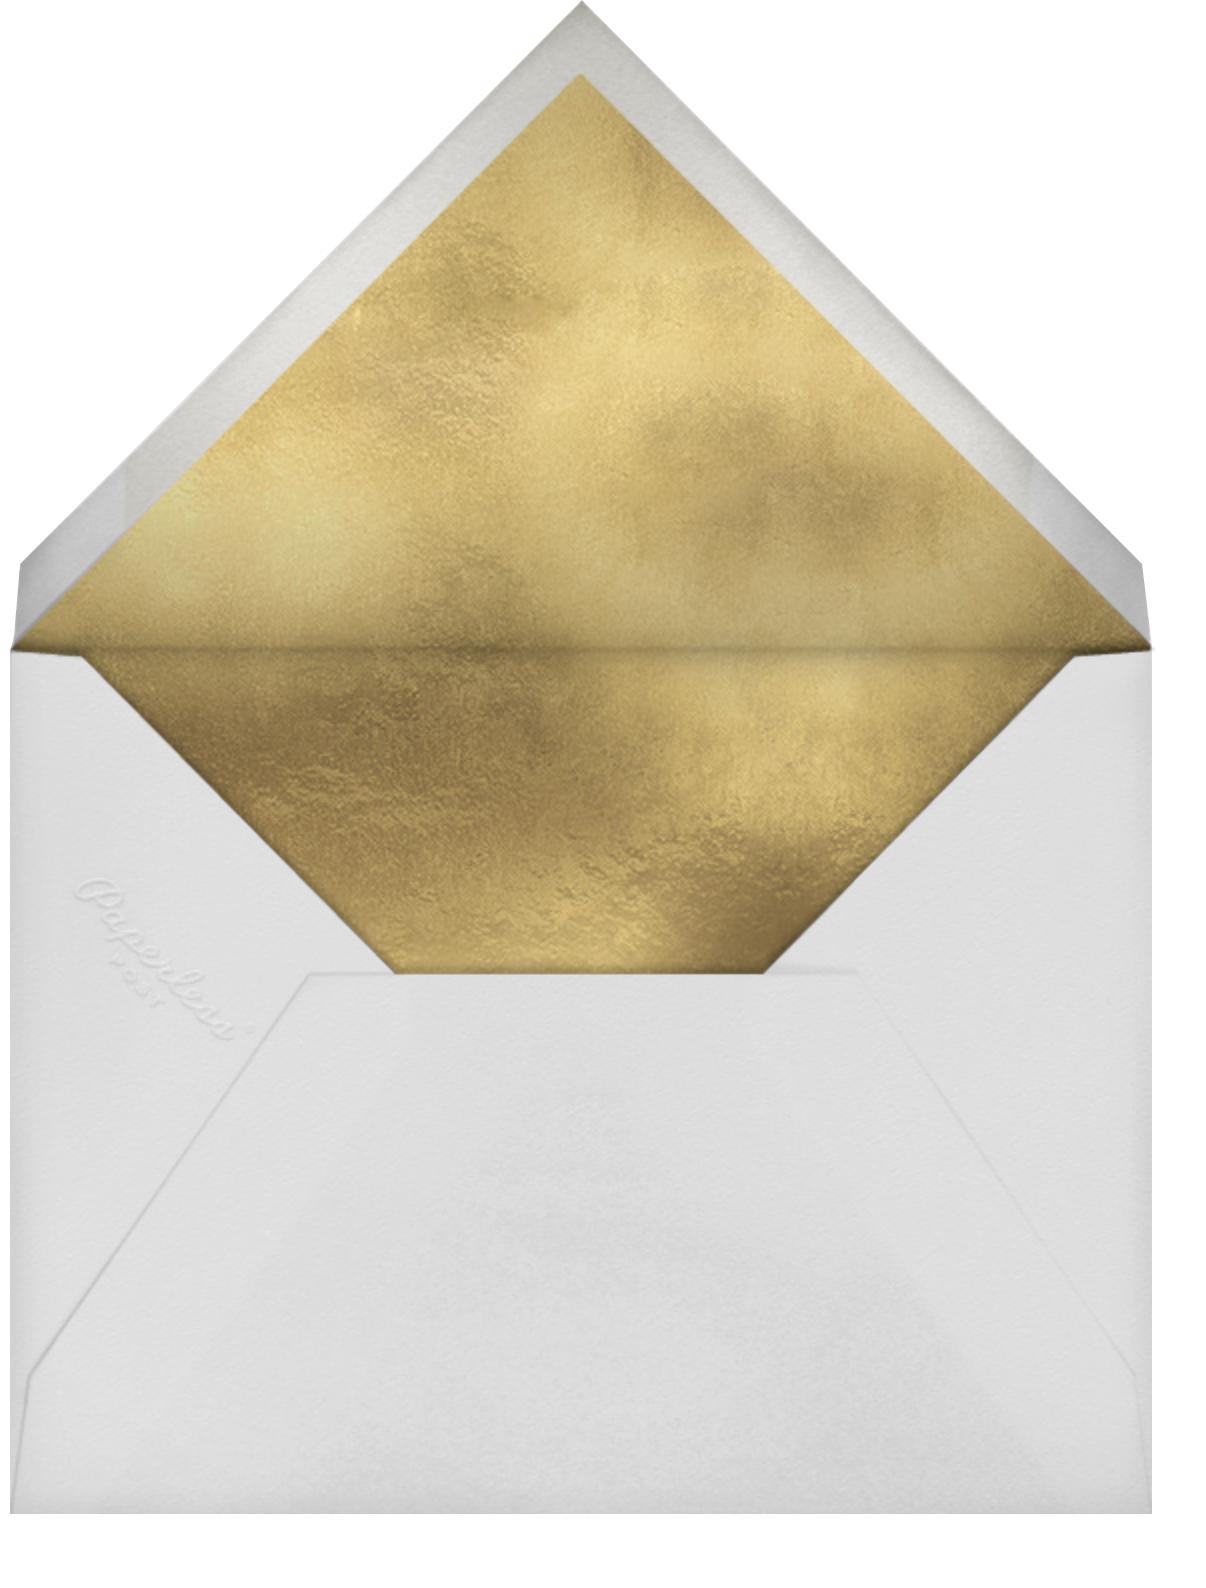 Party Sprinkles - kate spade new york - Kids' birthday - envelope back